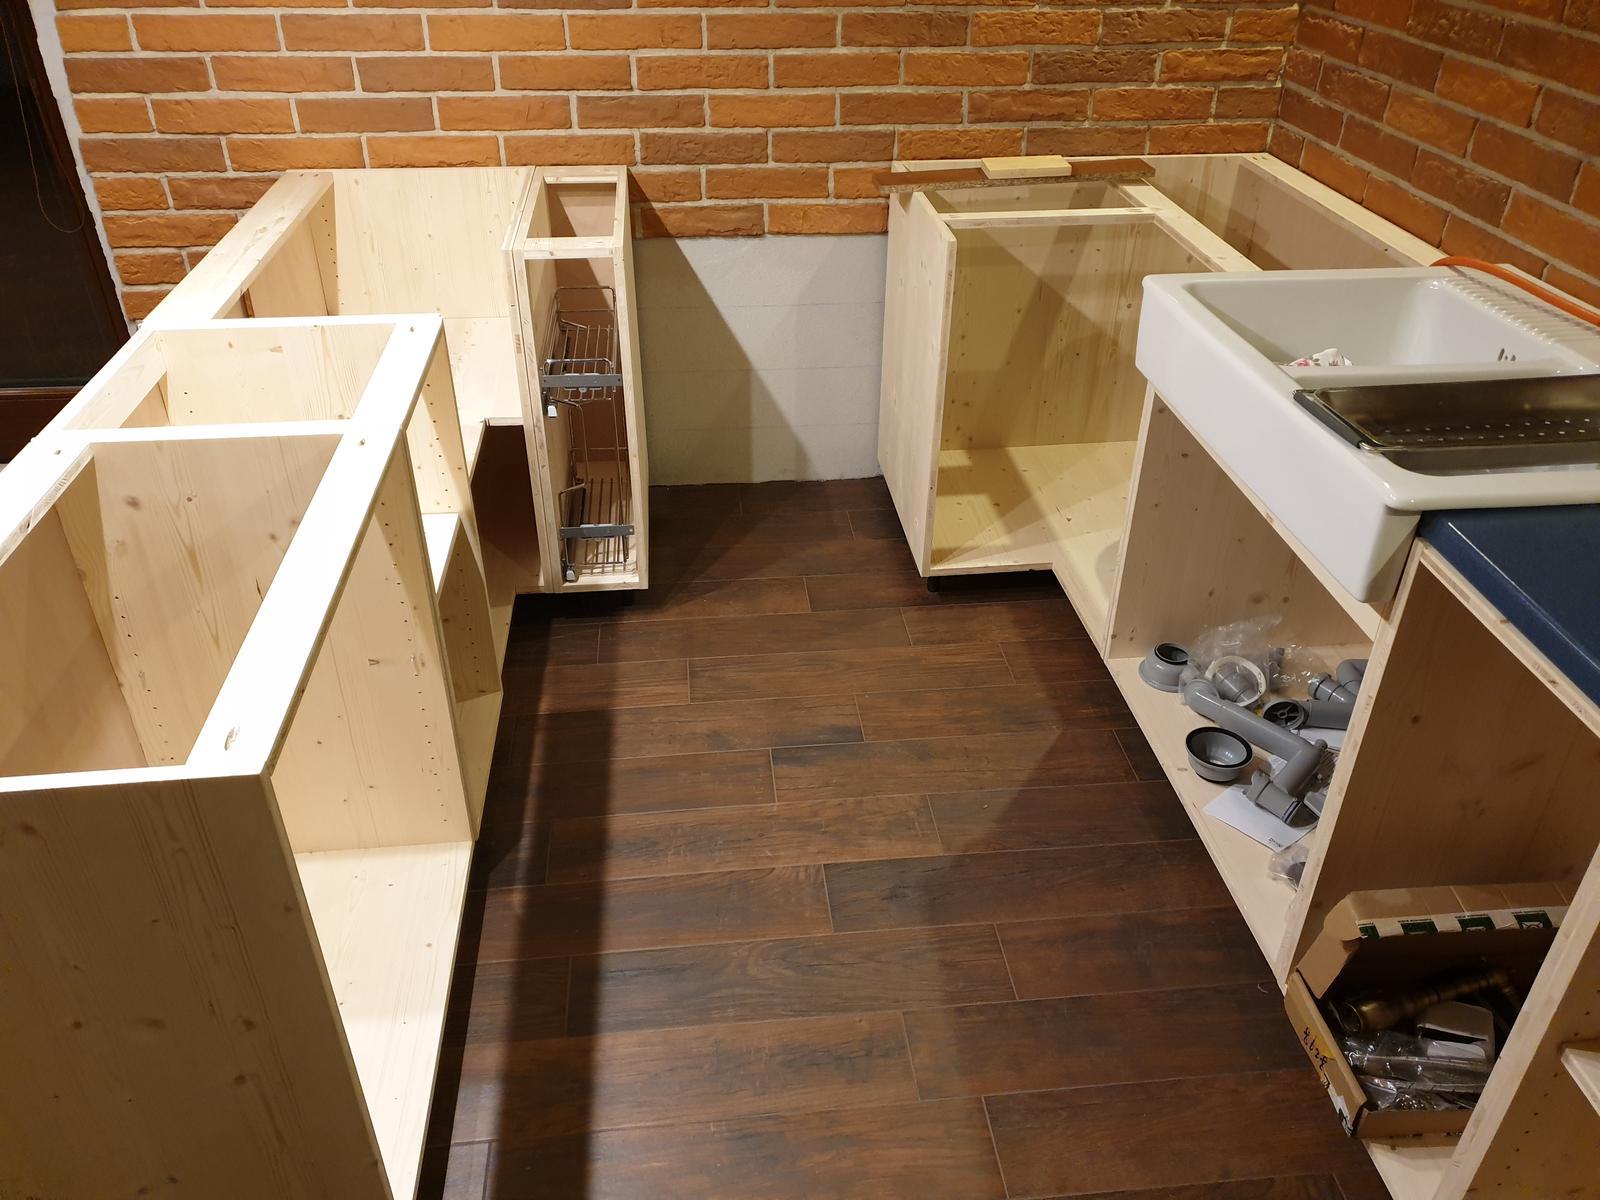 Kuchyňa svojpomocne - Doplnena aj rohova skrinka. uz len skrinka pre vstavanu ruru